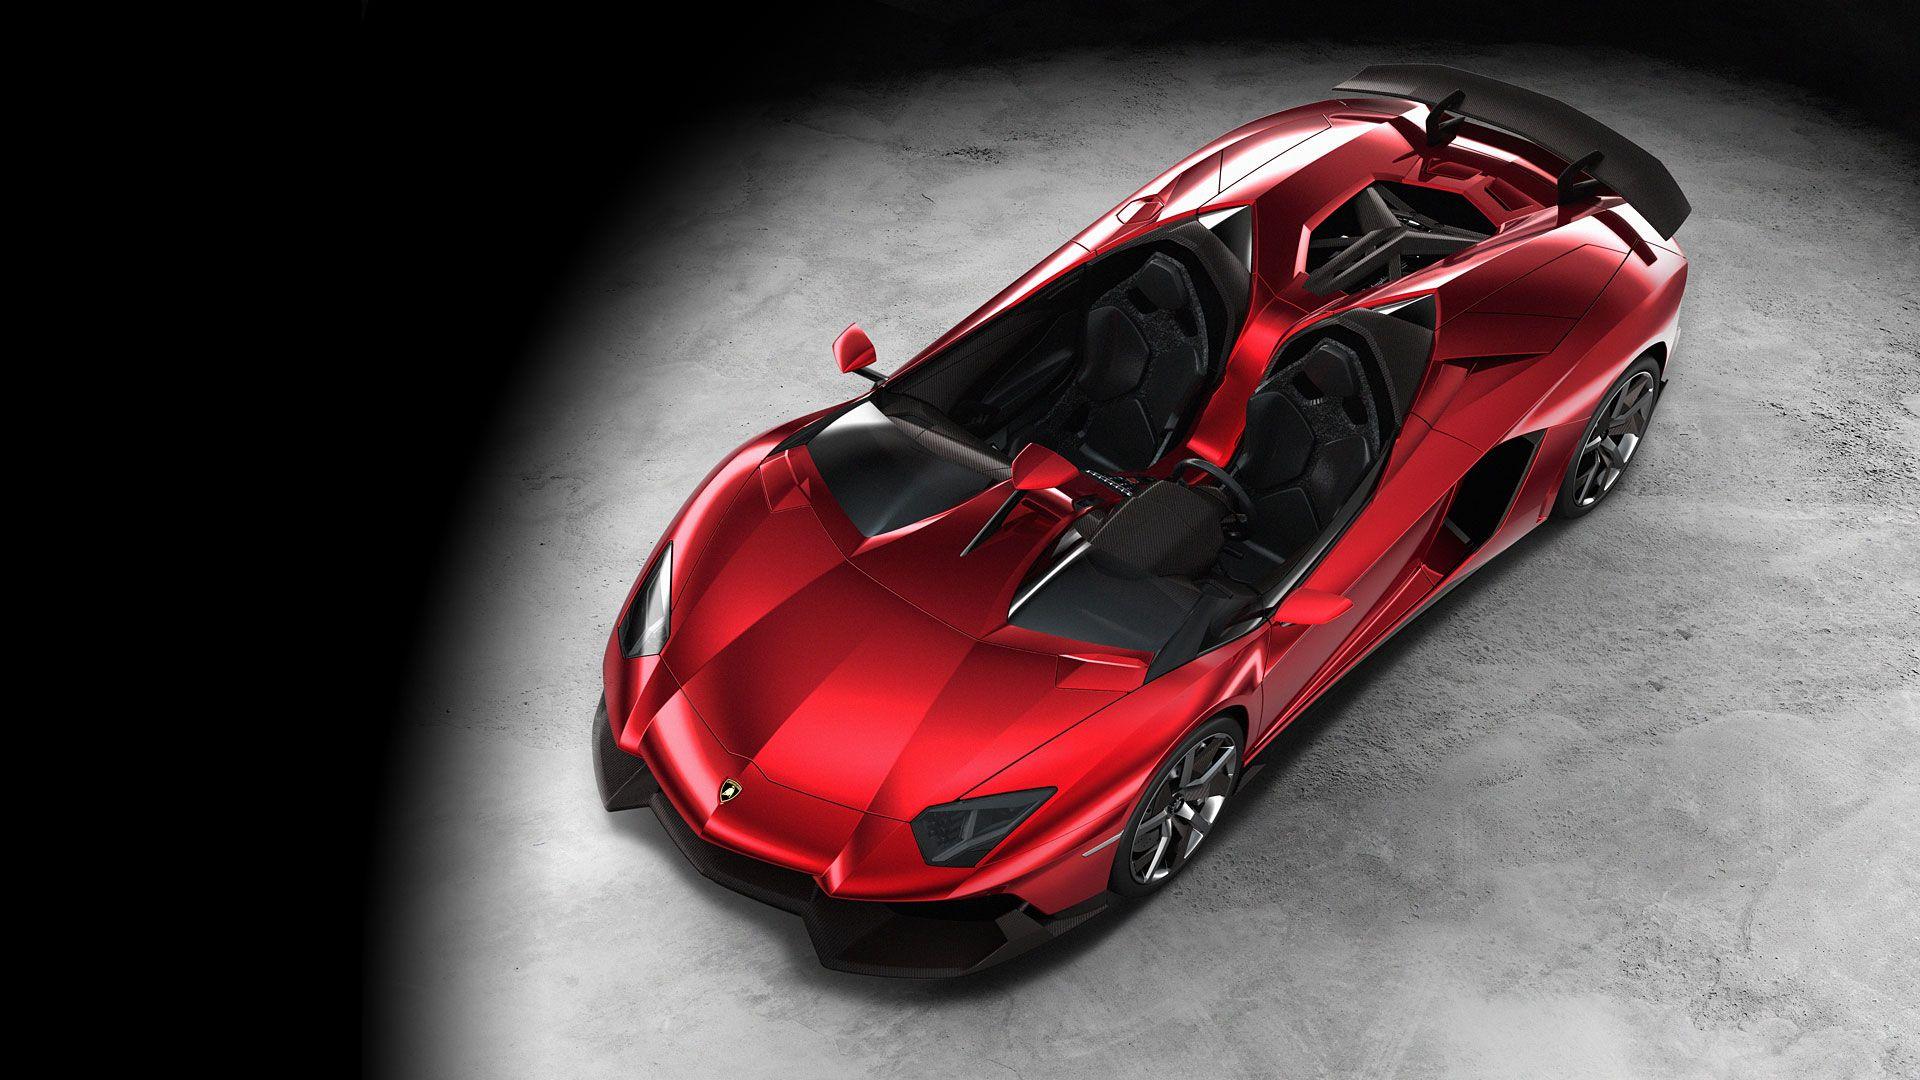 Luxury car toys  The unique expertise of Automobili Lamborghini in the field of